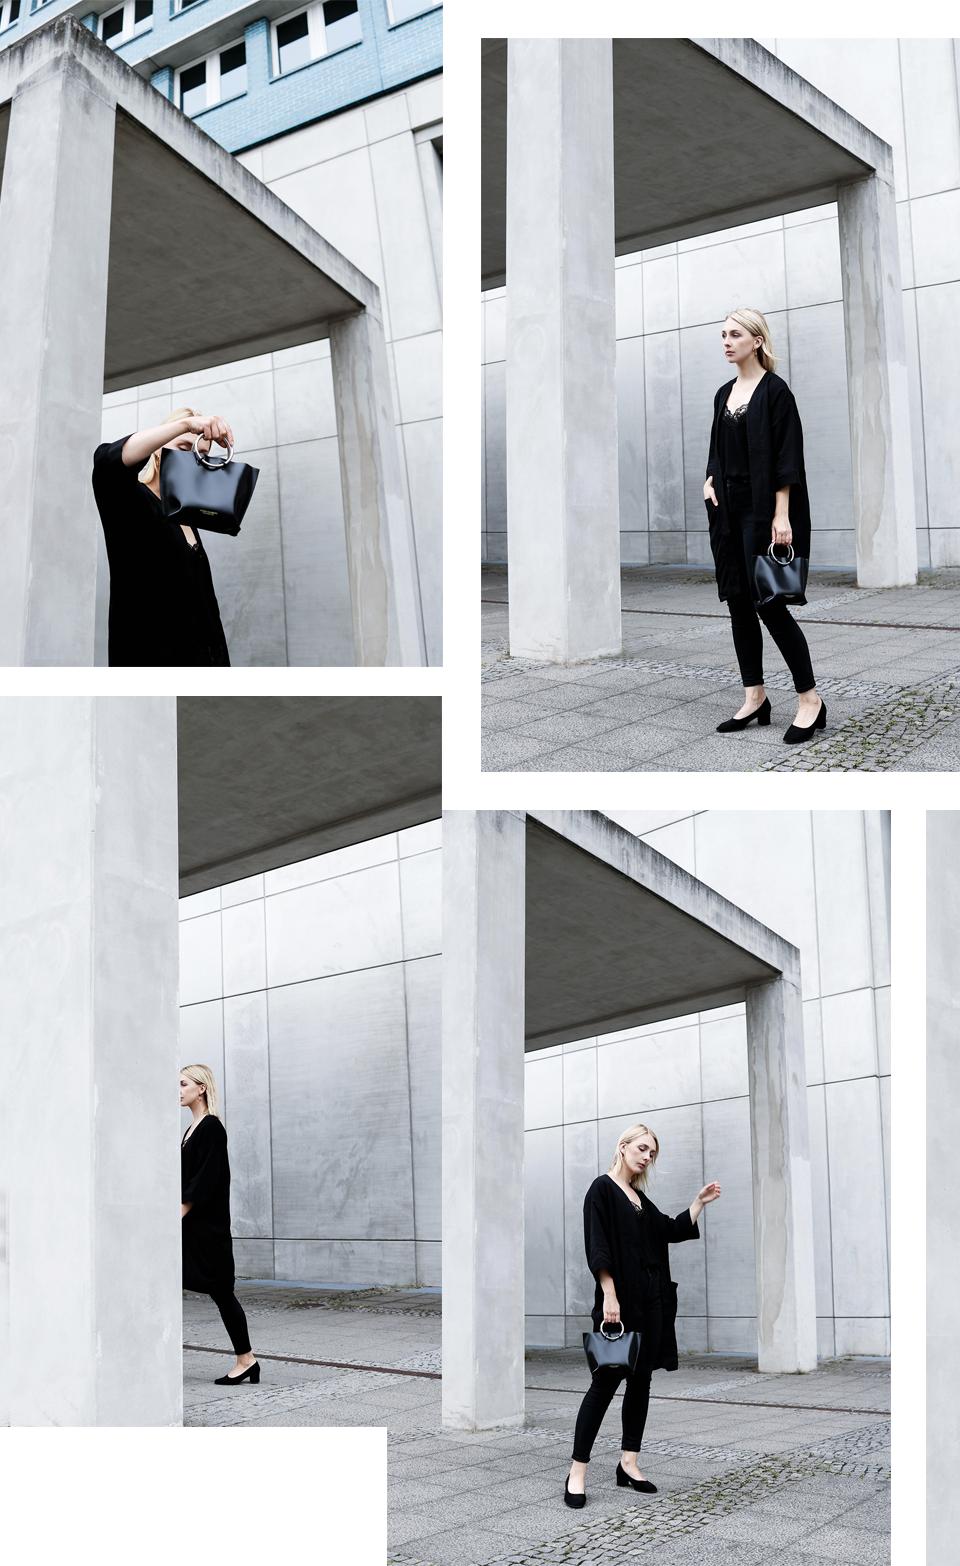 noa-noir-fashion-outfit-monochrome-all-black-inspiration-1.png